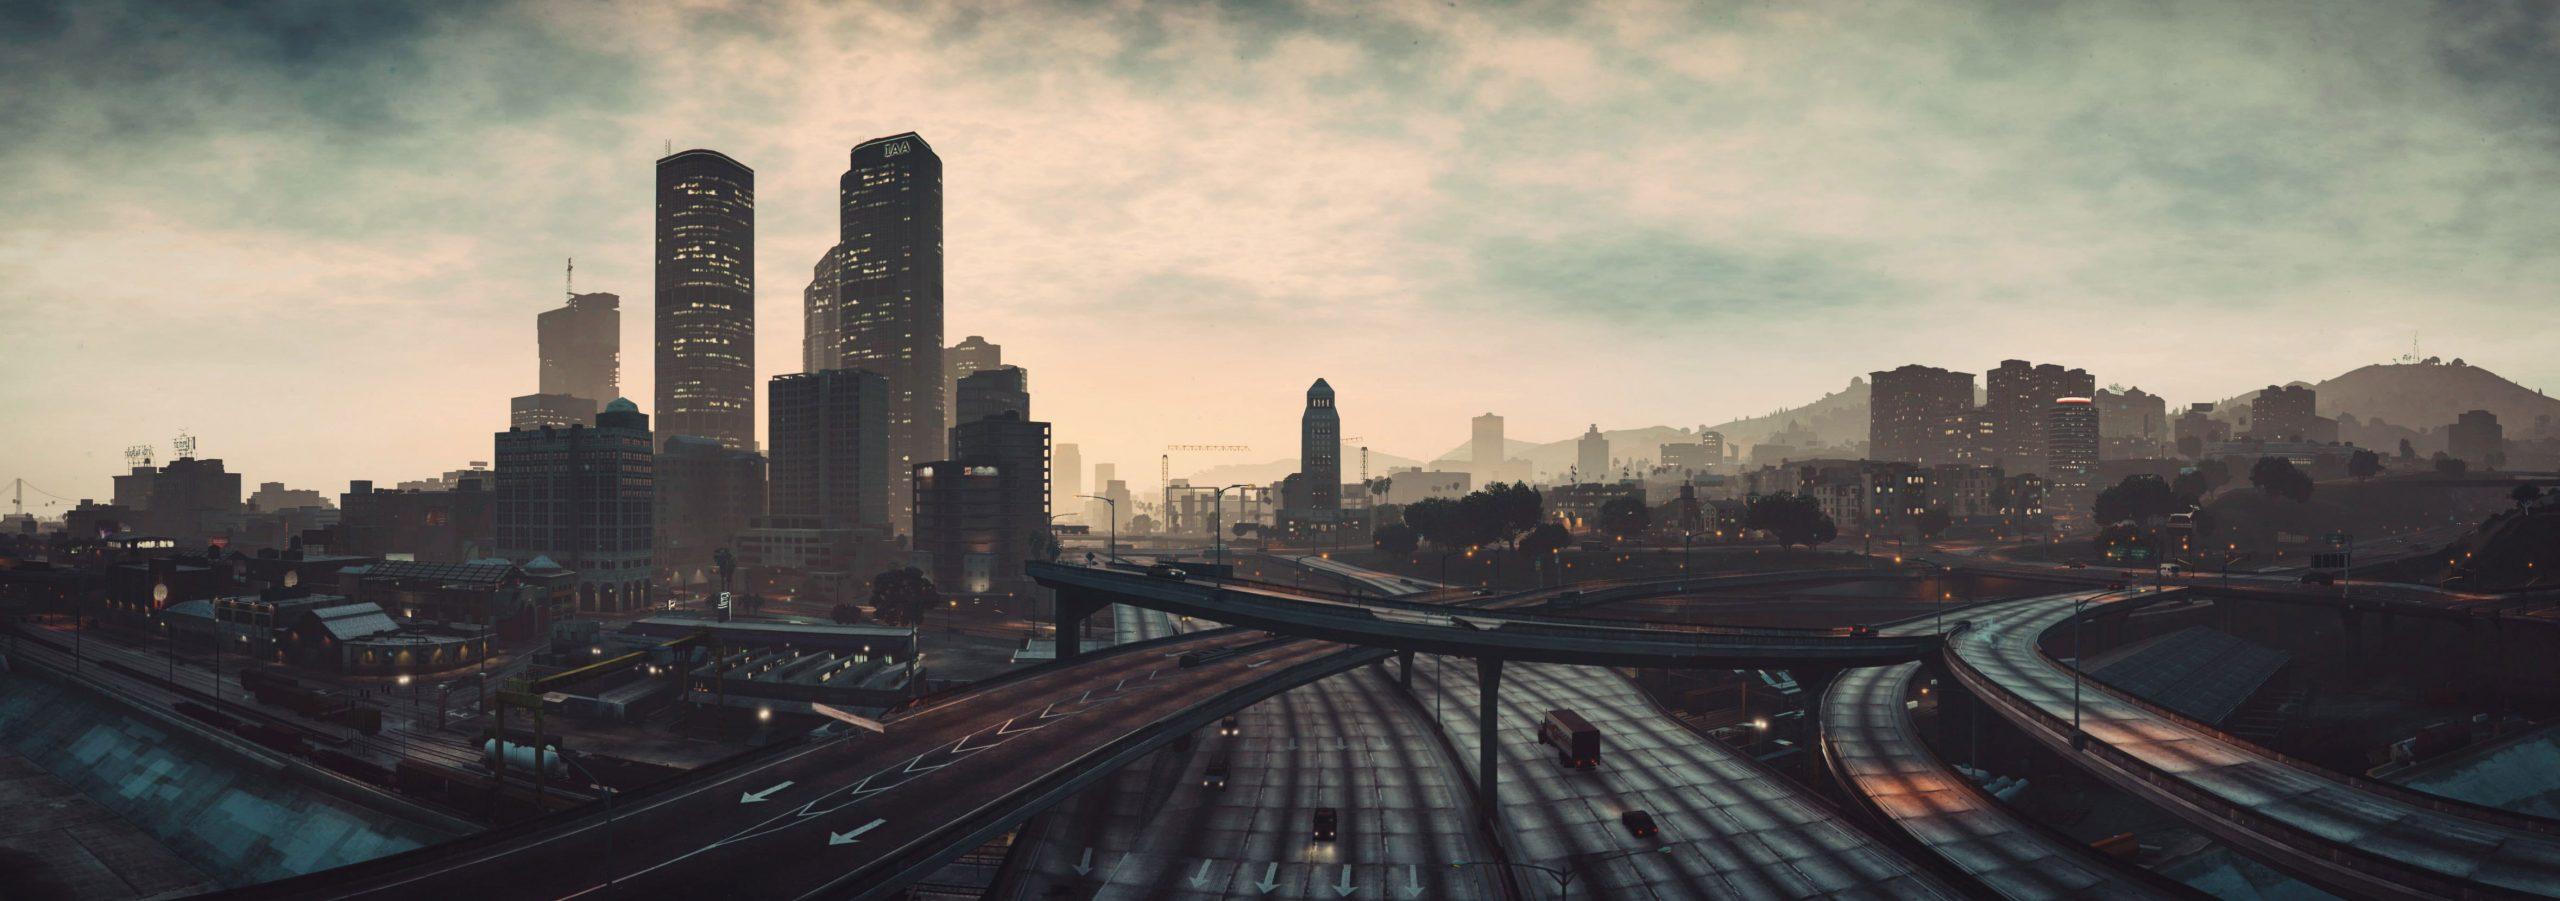 City Wallpaper